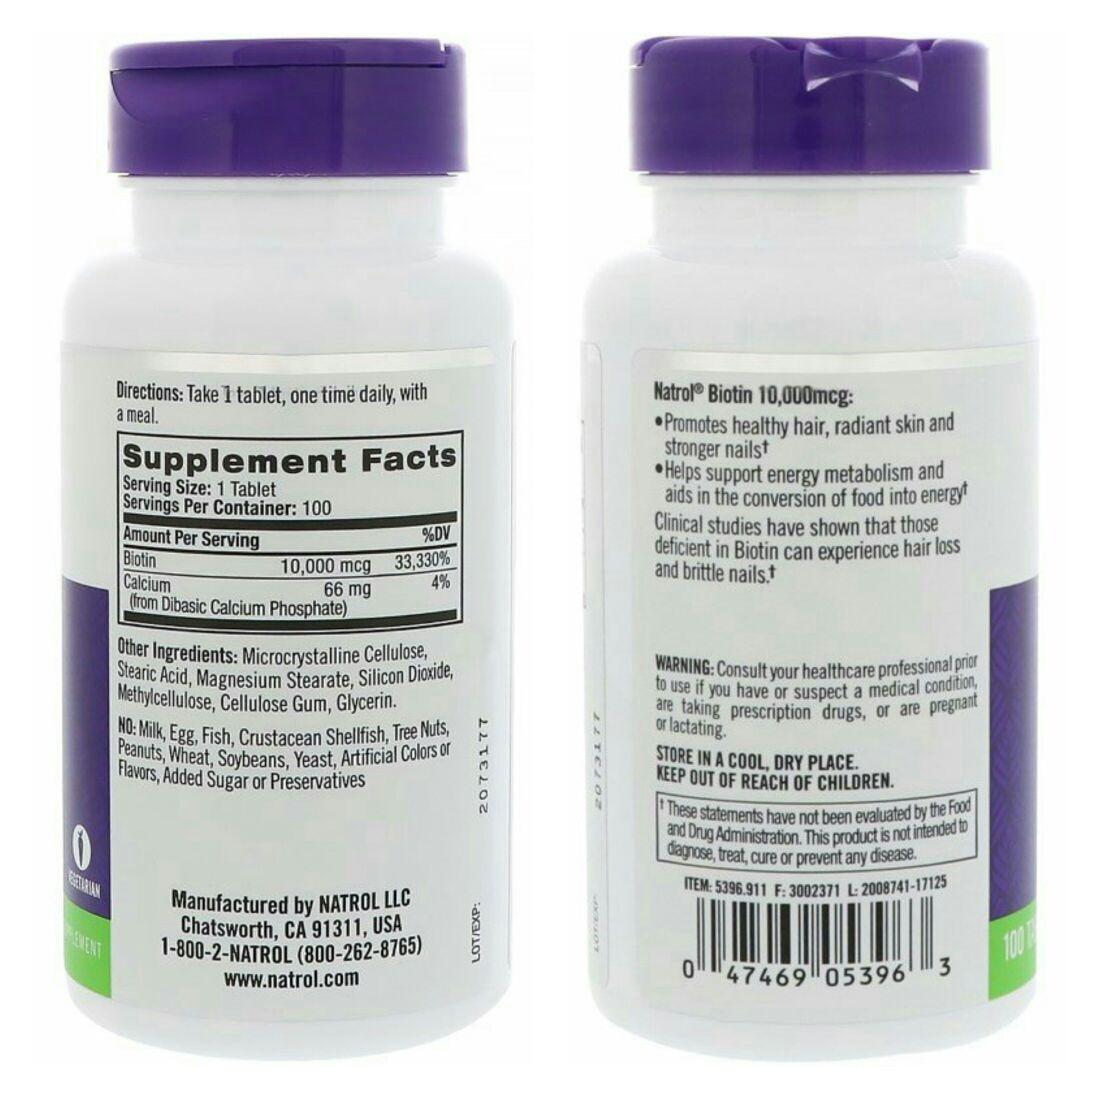 Biotina 10000mcg 100 Tablets Natrol Maximum Strength R 6290 Em Biotin 10000 Mcg Carregando Zoom